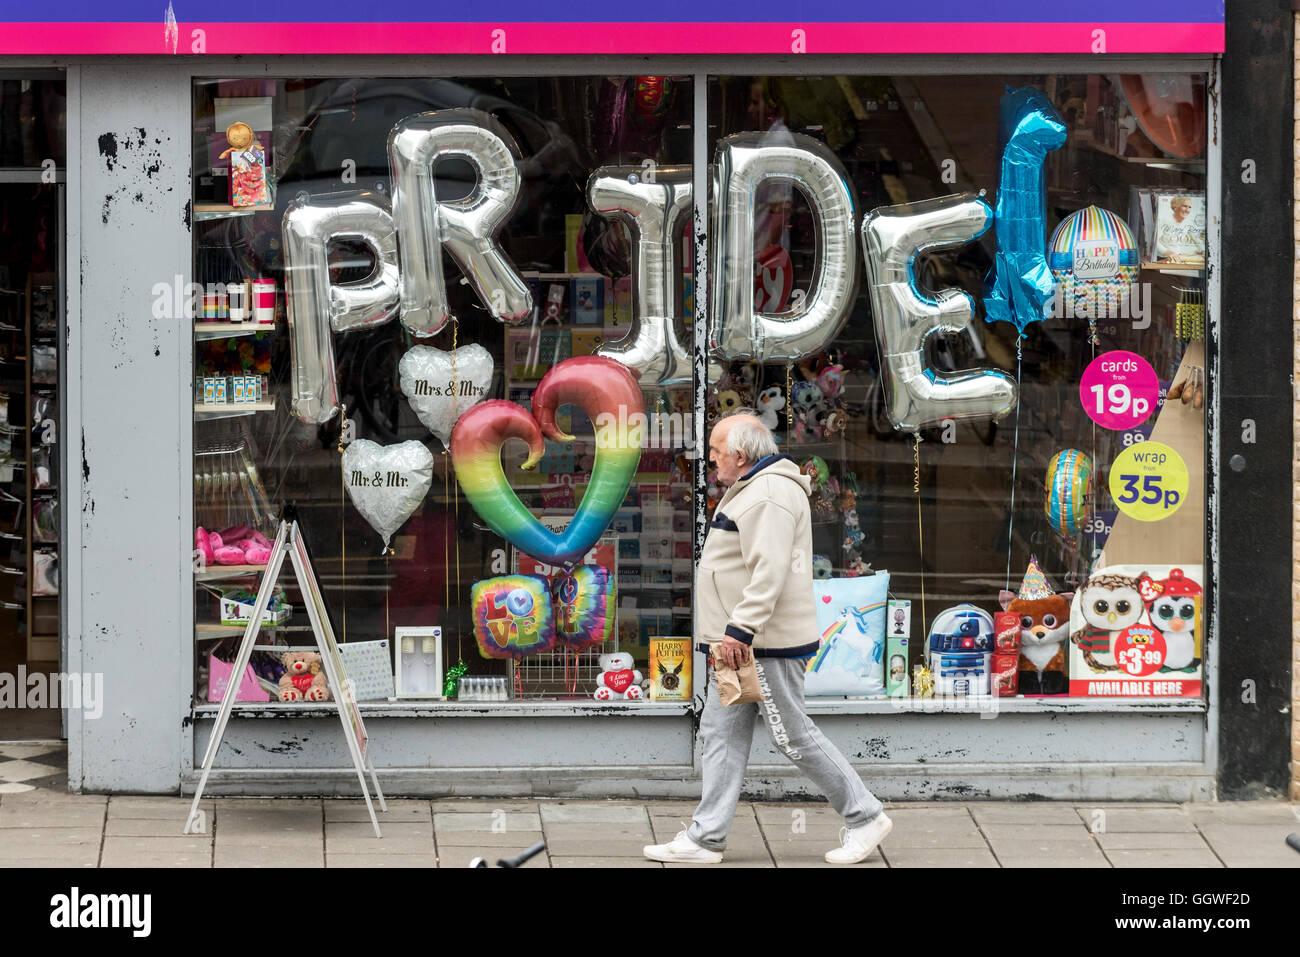 A shop window display celebrating Pride weekend in Brighton - Stock Image